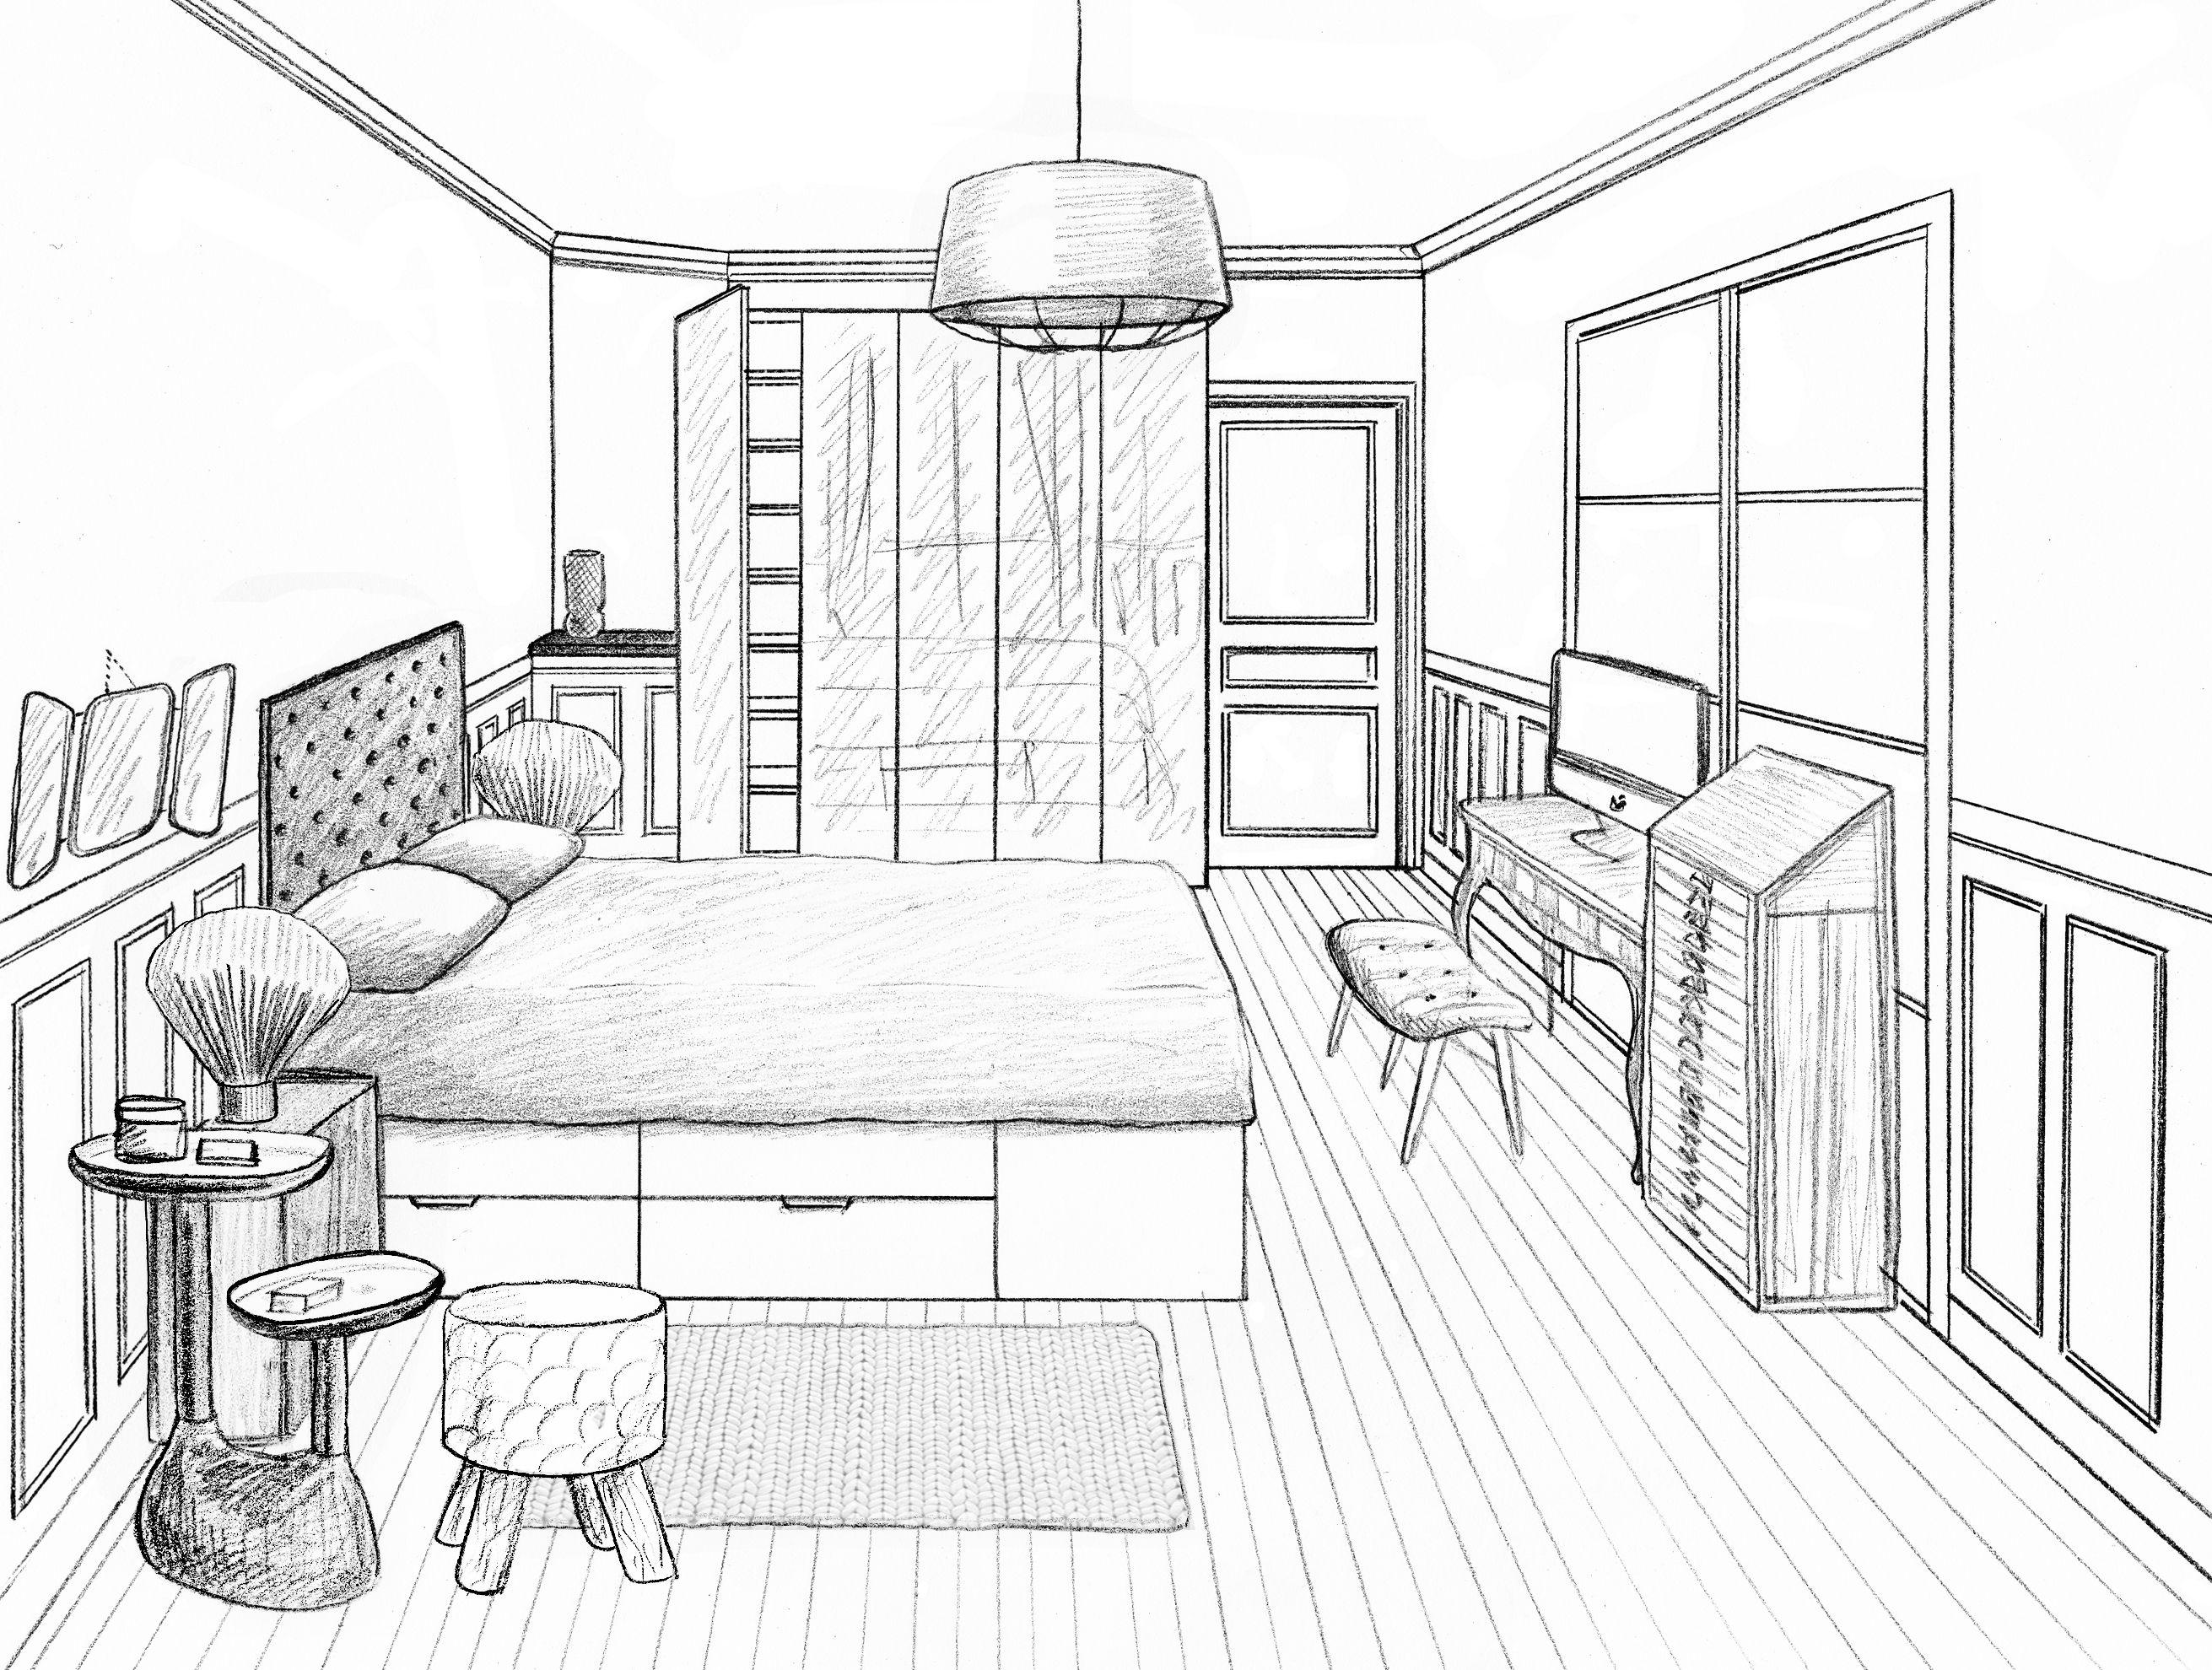 Épinglé par maliki sur Dessins  Chambre ado dessin, Maison dessin